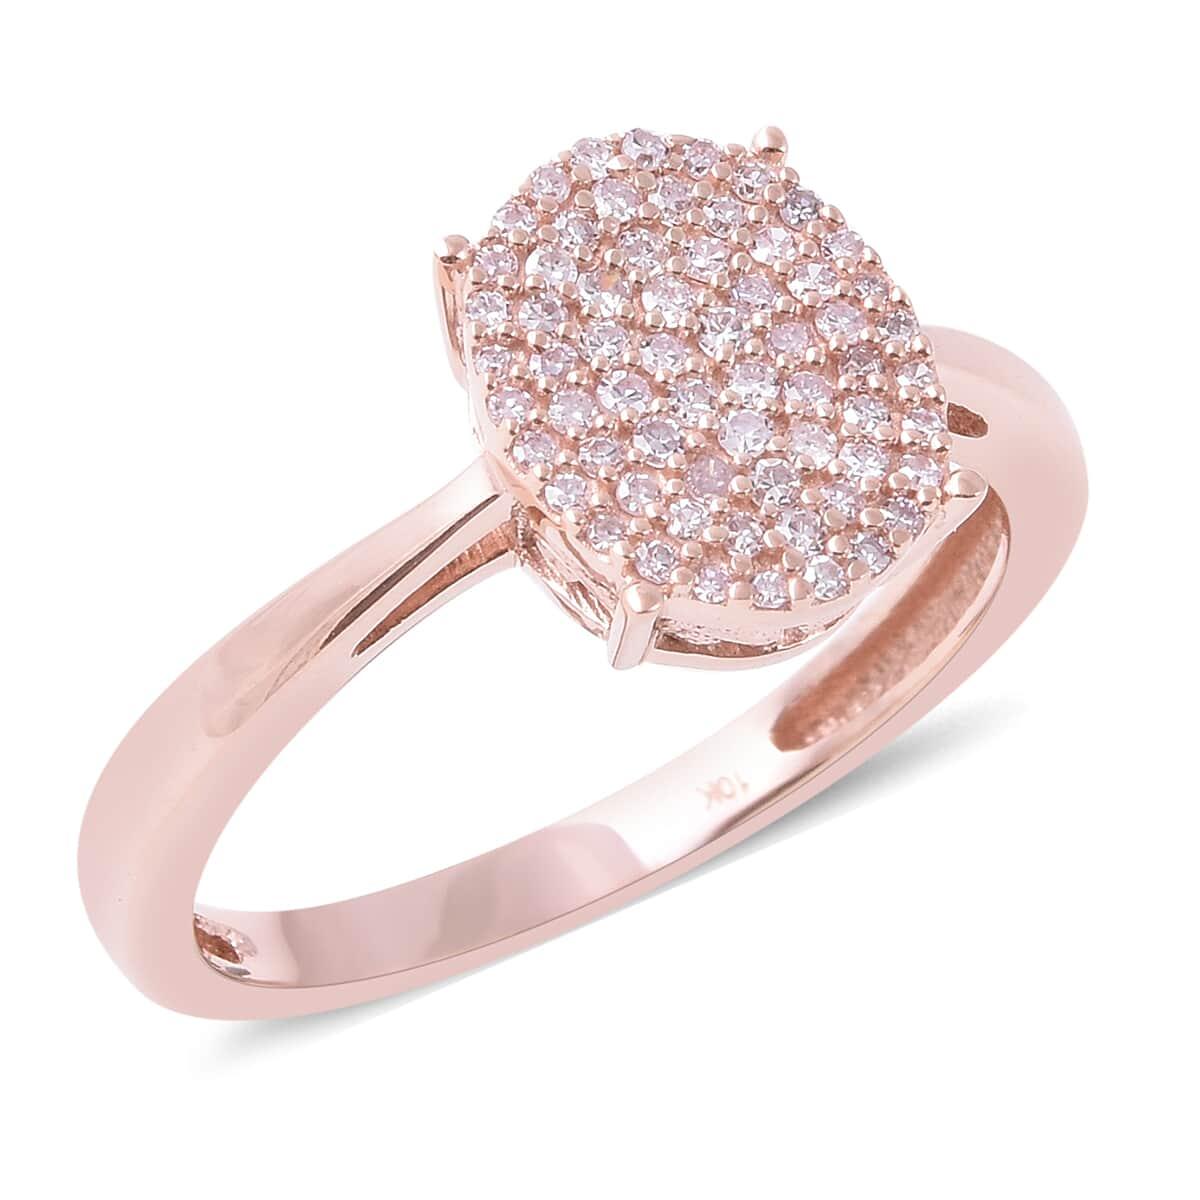 0.25 Ctw Natural Pink Diamond Ring In 10K Rose Gold (Size